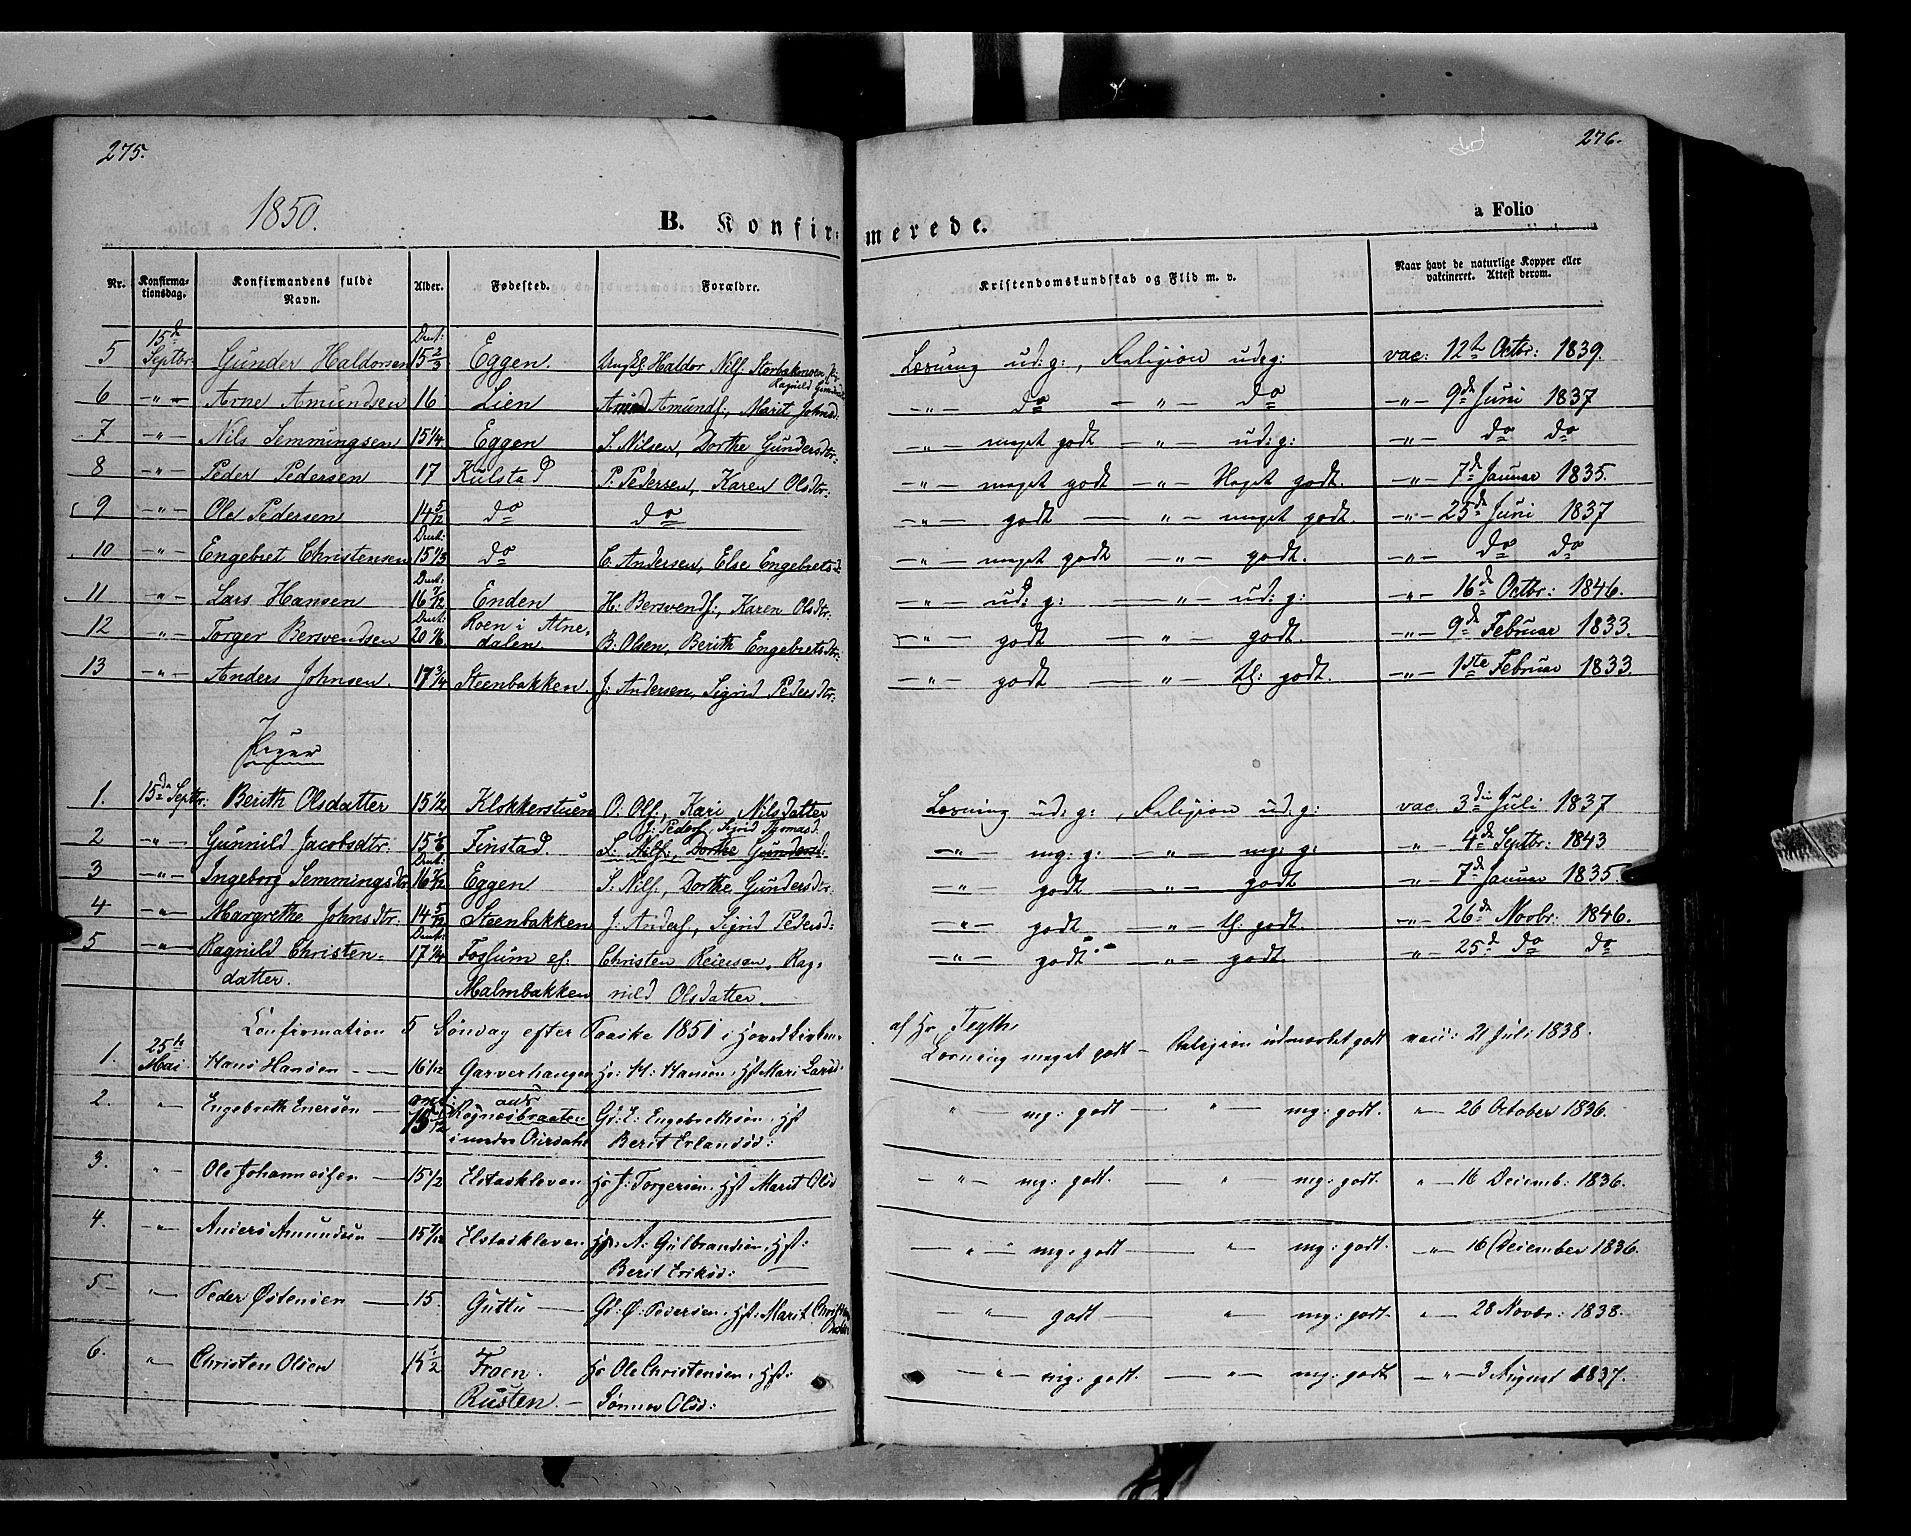 SAH, Ringebu prestekontor, Ministerialbok nr. 6, 1848-1859, s. 275-276